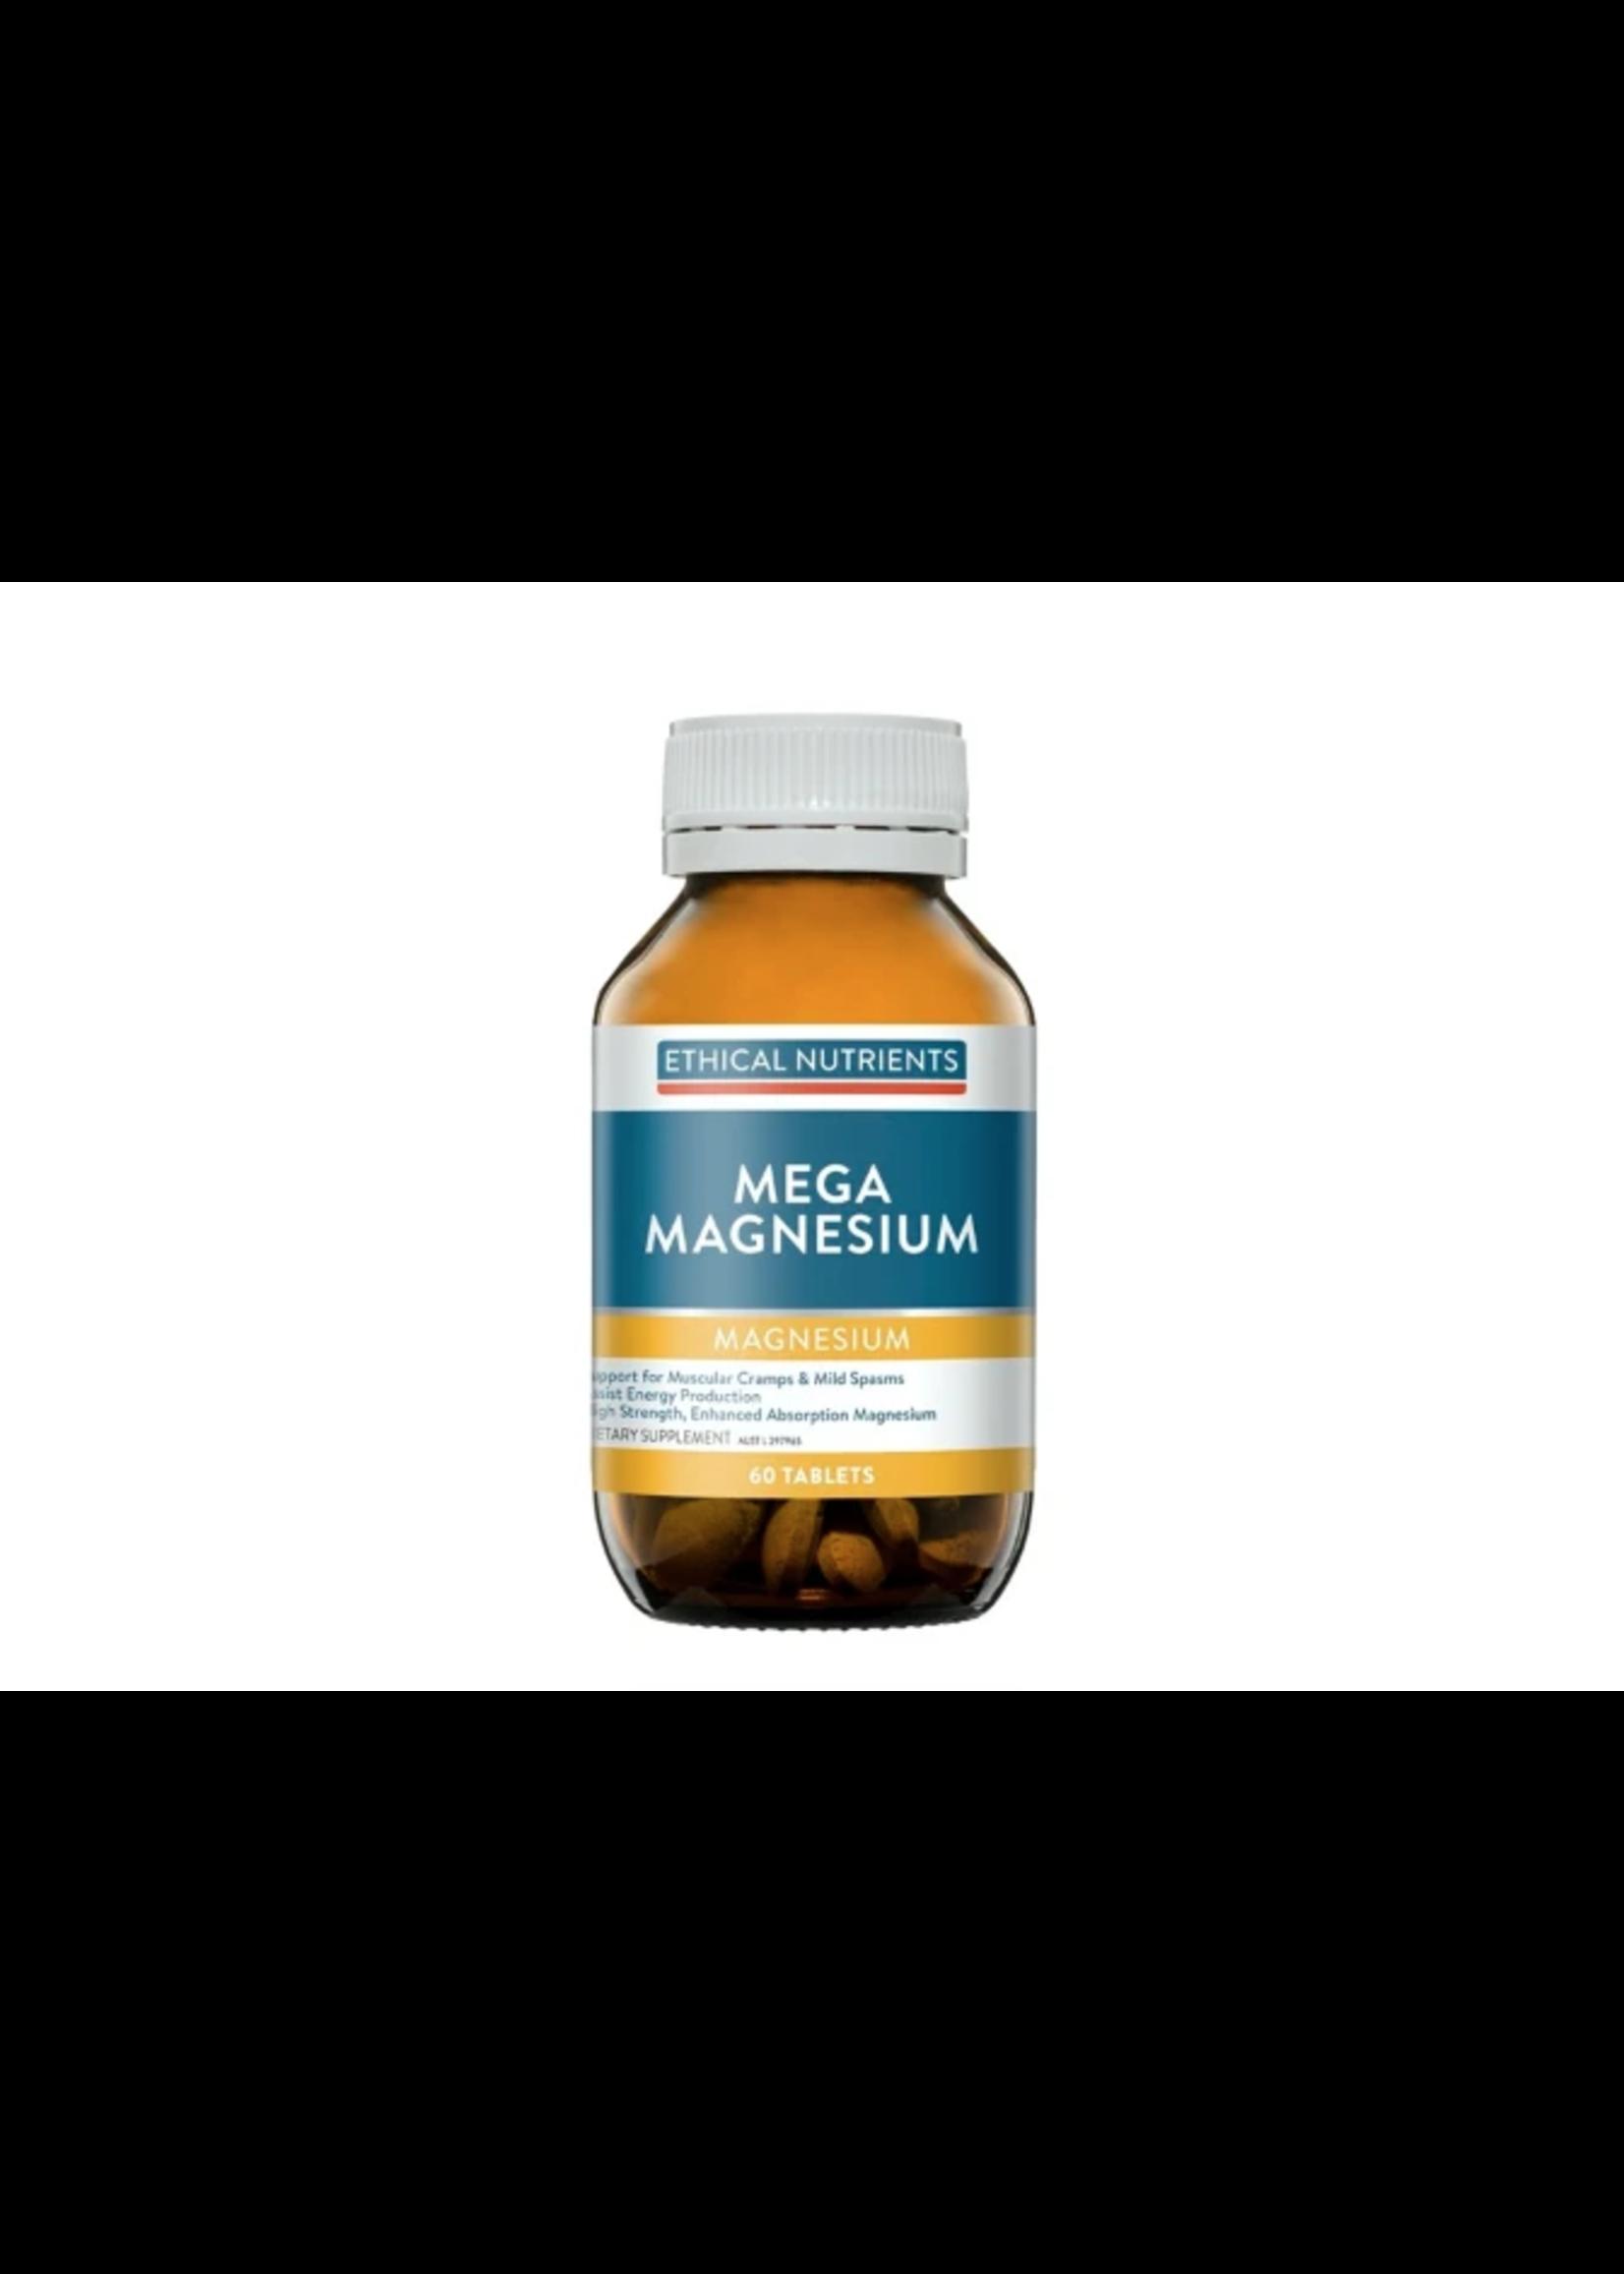 ethical metagenics Ethical Nutrients Mega Magnesium 60 tabs megazorb